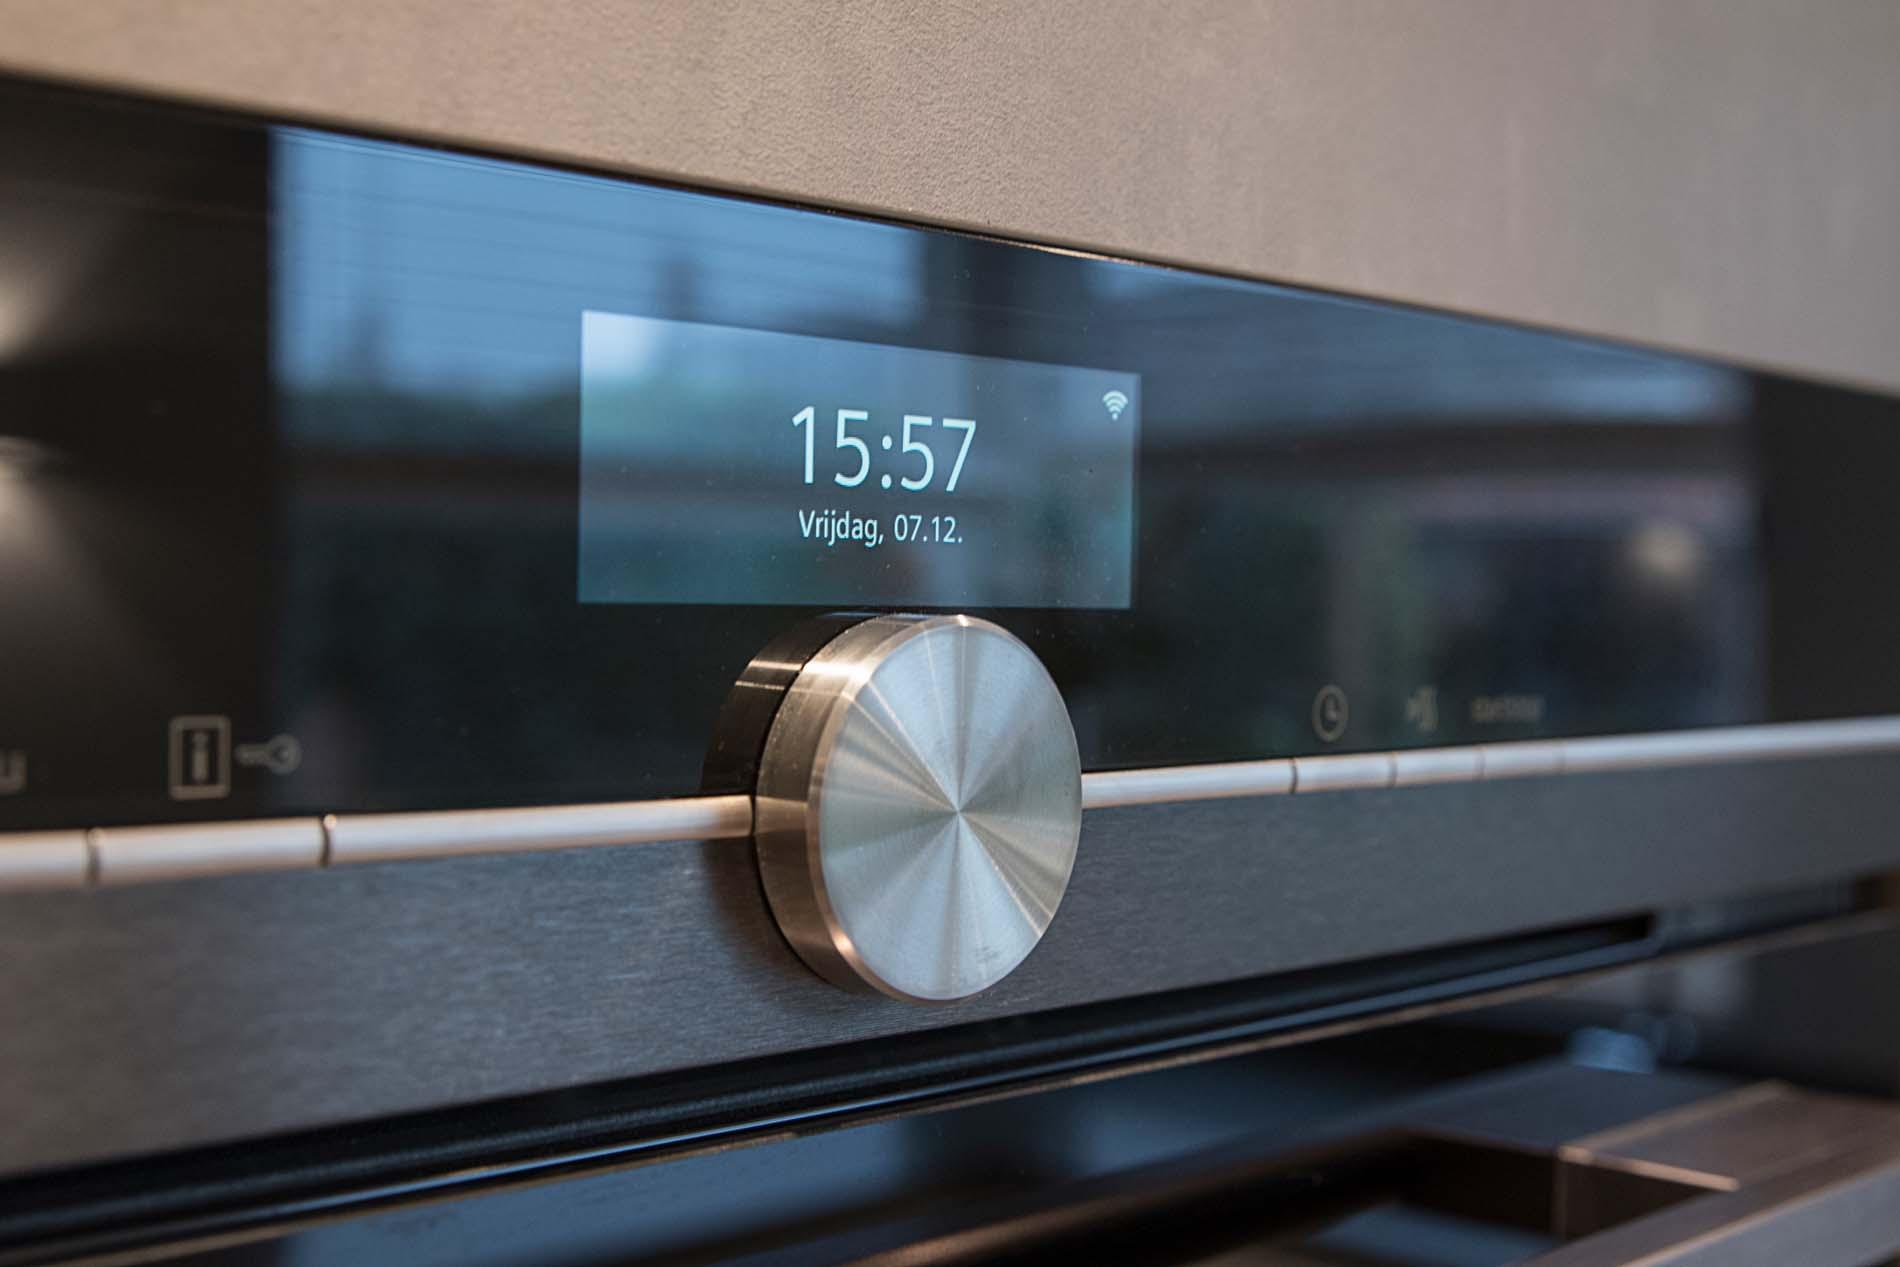 Siemens StudioLine bakoven met magnetron, Keukenapparatuur ASWA Keukens